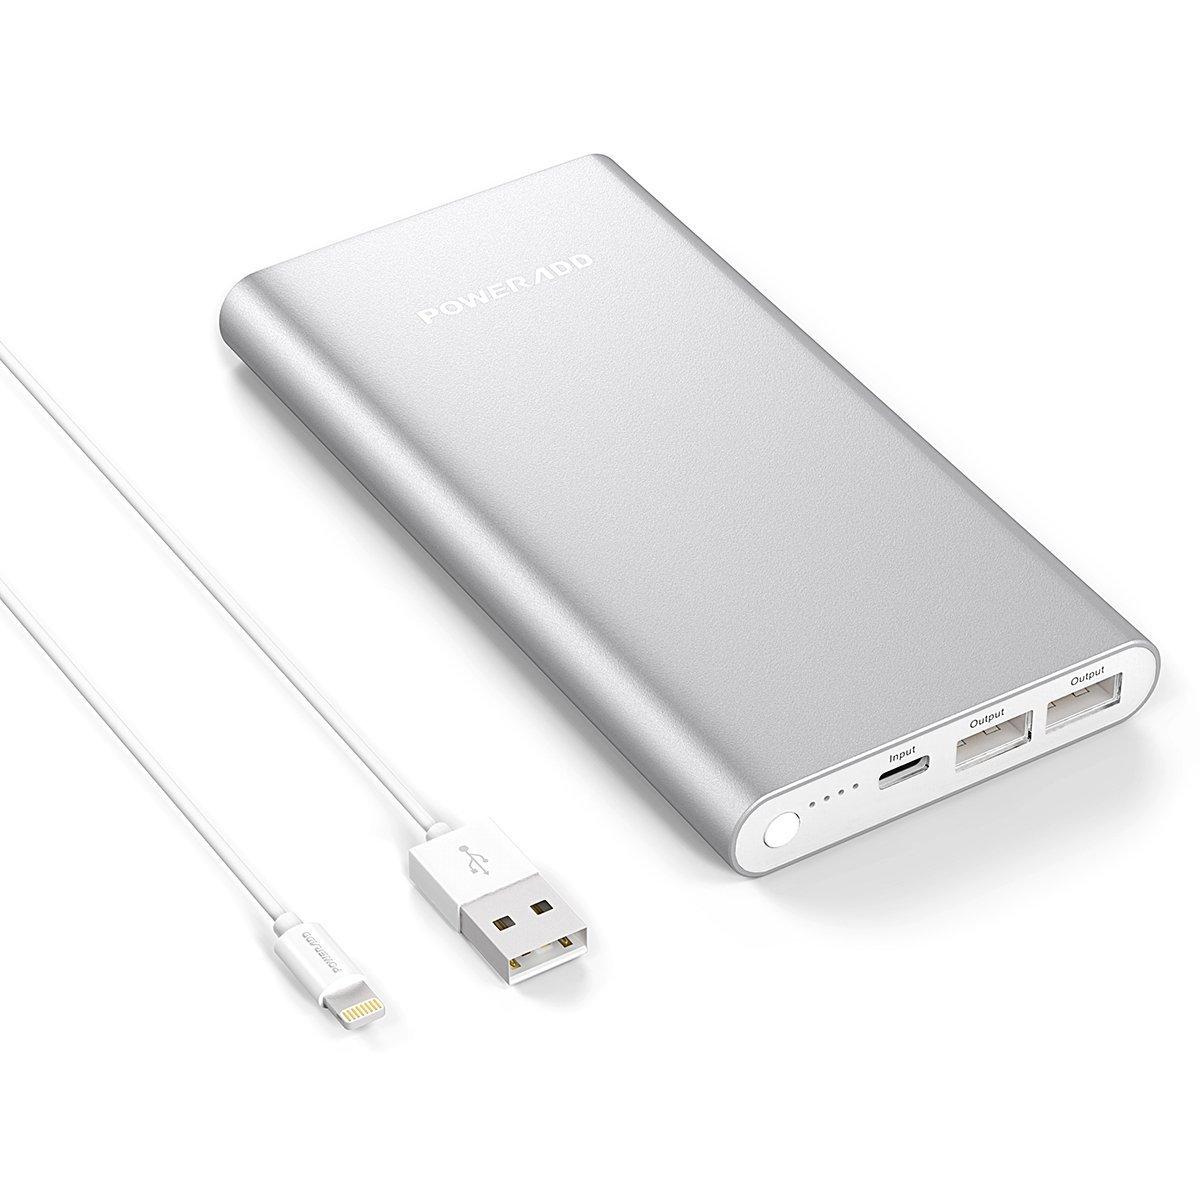 Apple Lightning Cargador Portátil Poweradd Pilot GS mAh Cargador Portátil Batería Externa